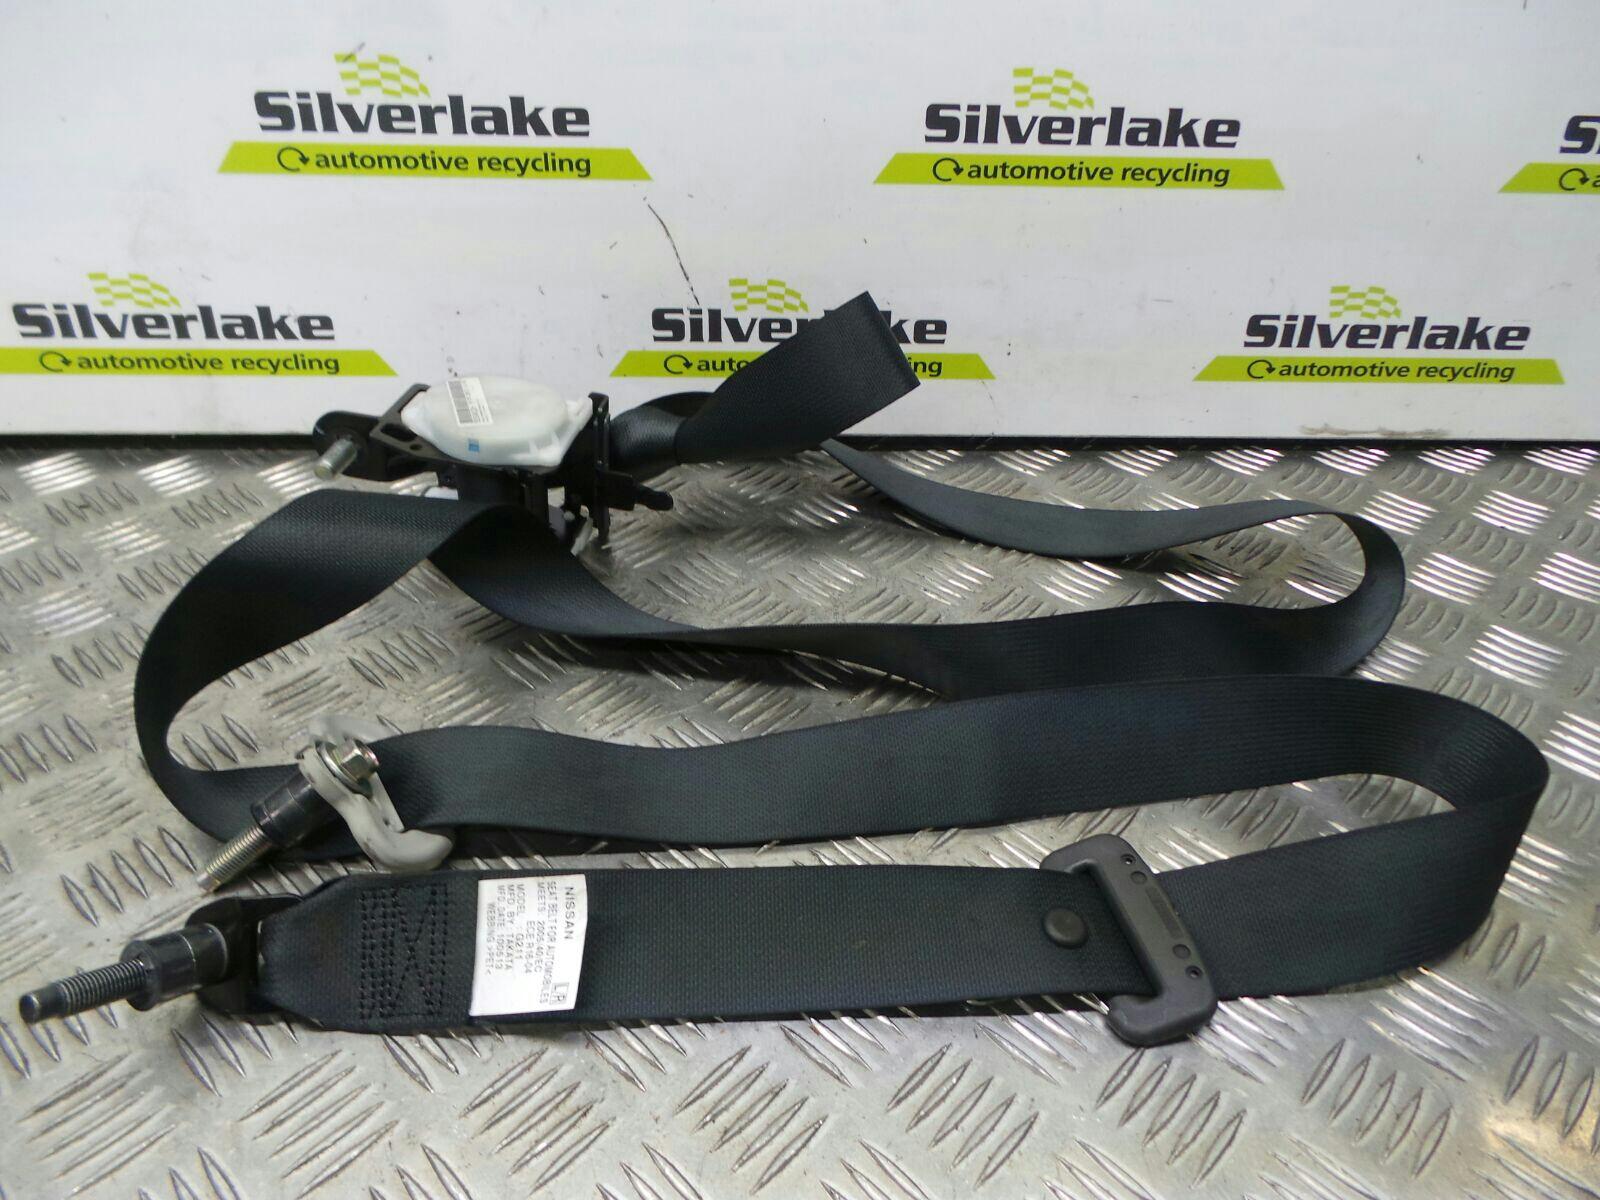 Nissan Navara 2010 To 2015 Tekna Double Cab Seat Belt Rear Reel LH